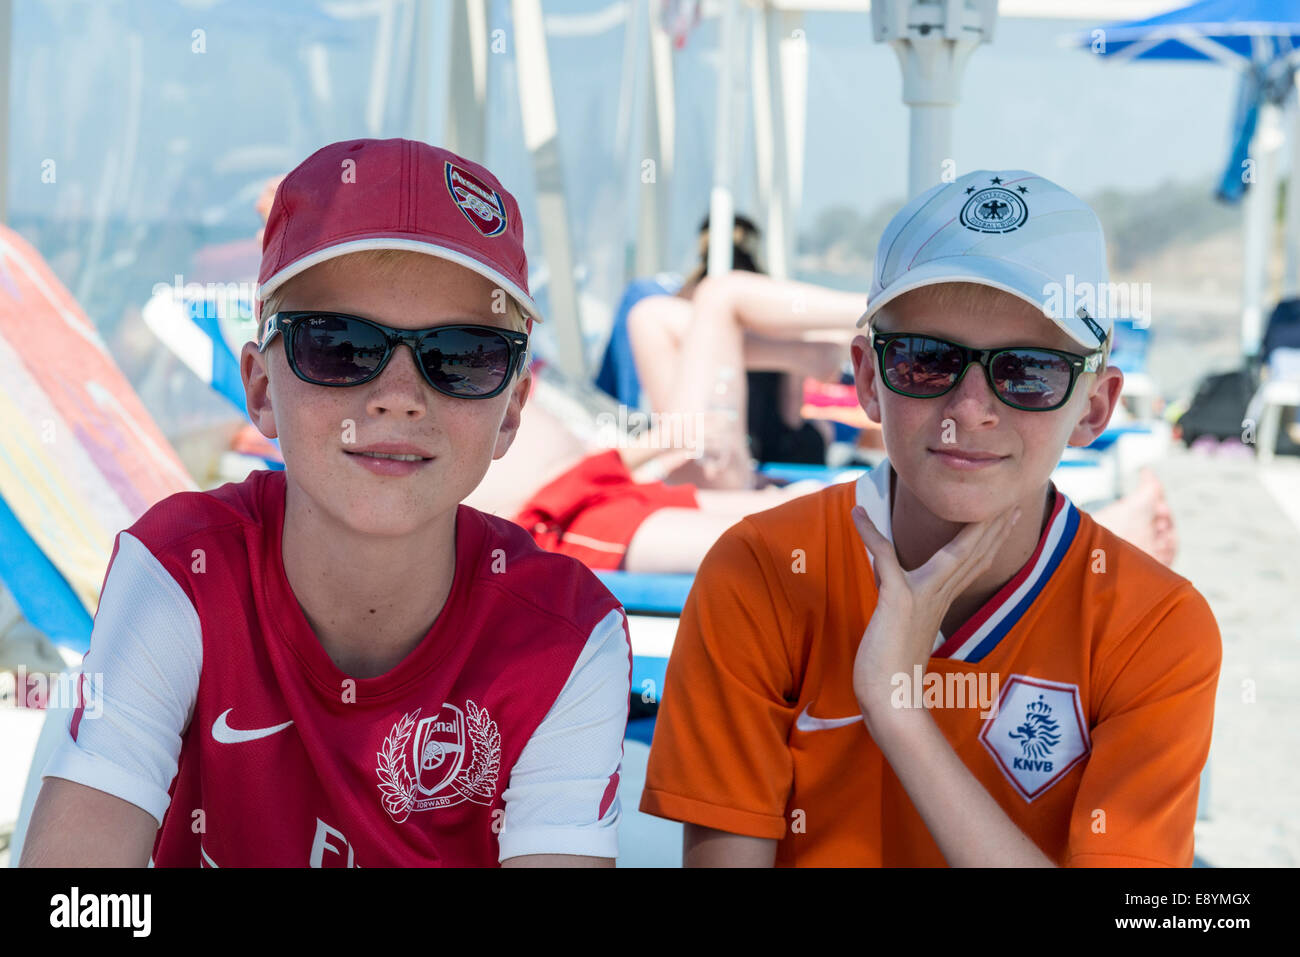 Two teenage boys with base-caps and sunglasses looking at camera Mastichari, Kos, Greece - Stock Image